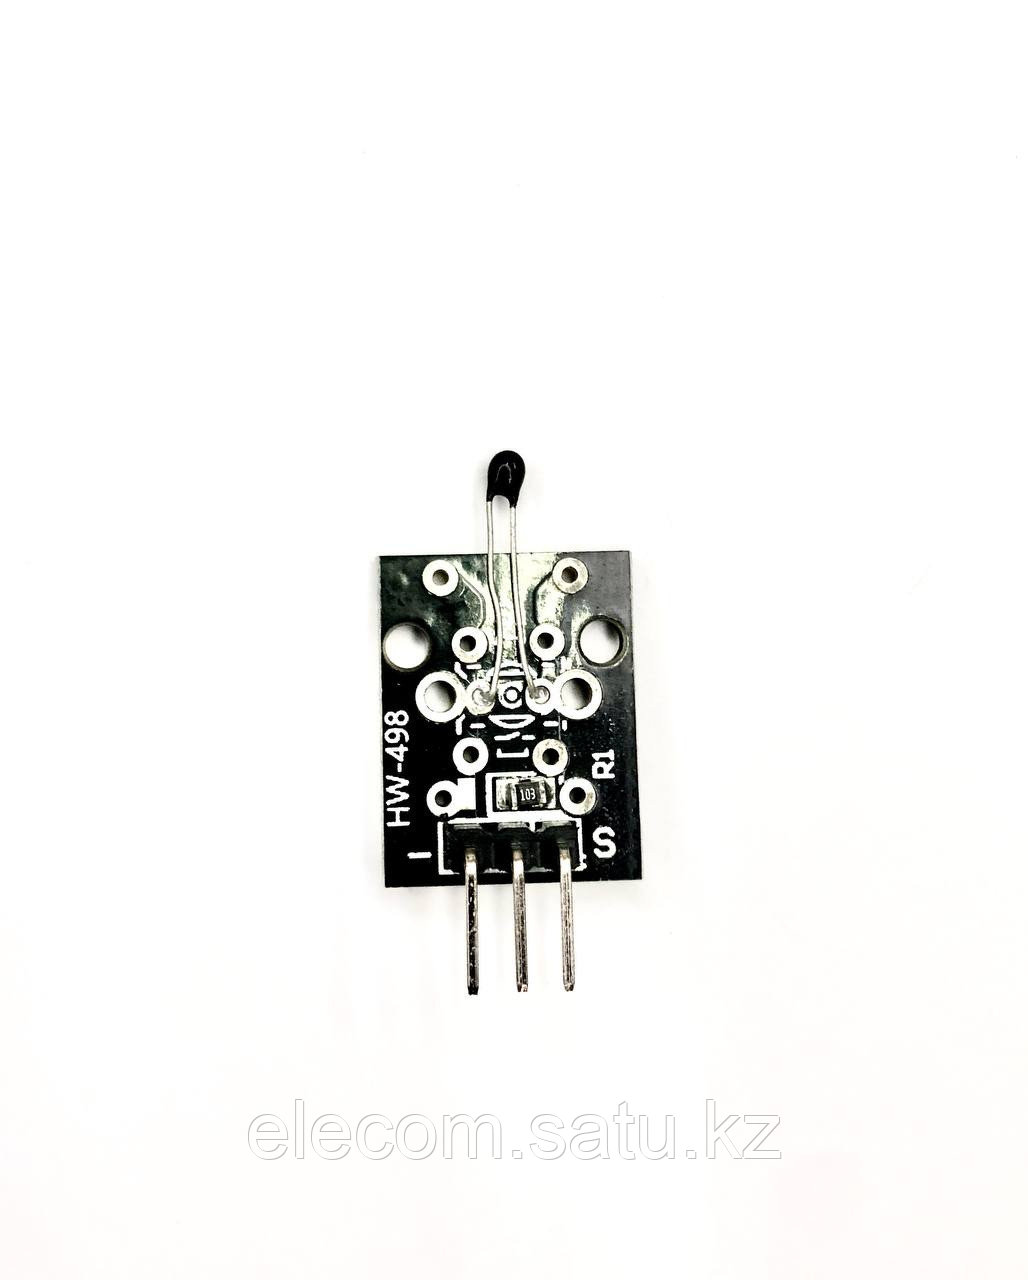 Термистор HW-498